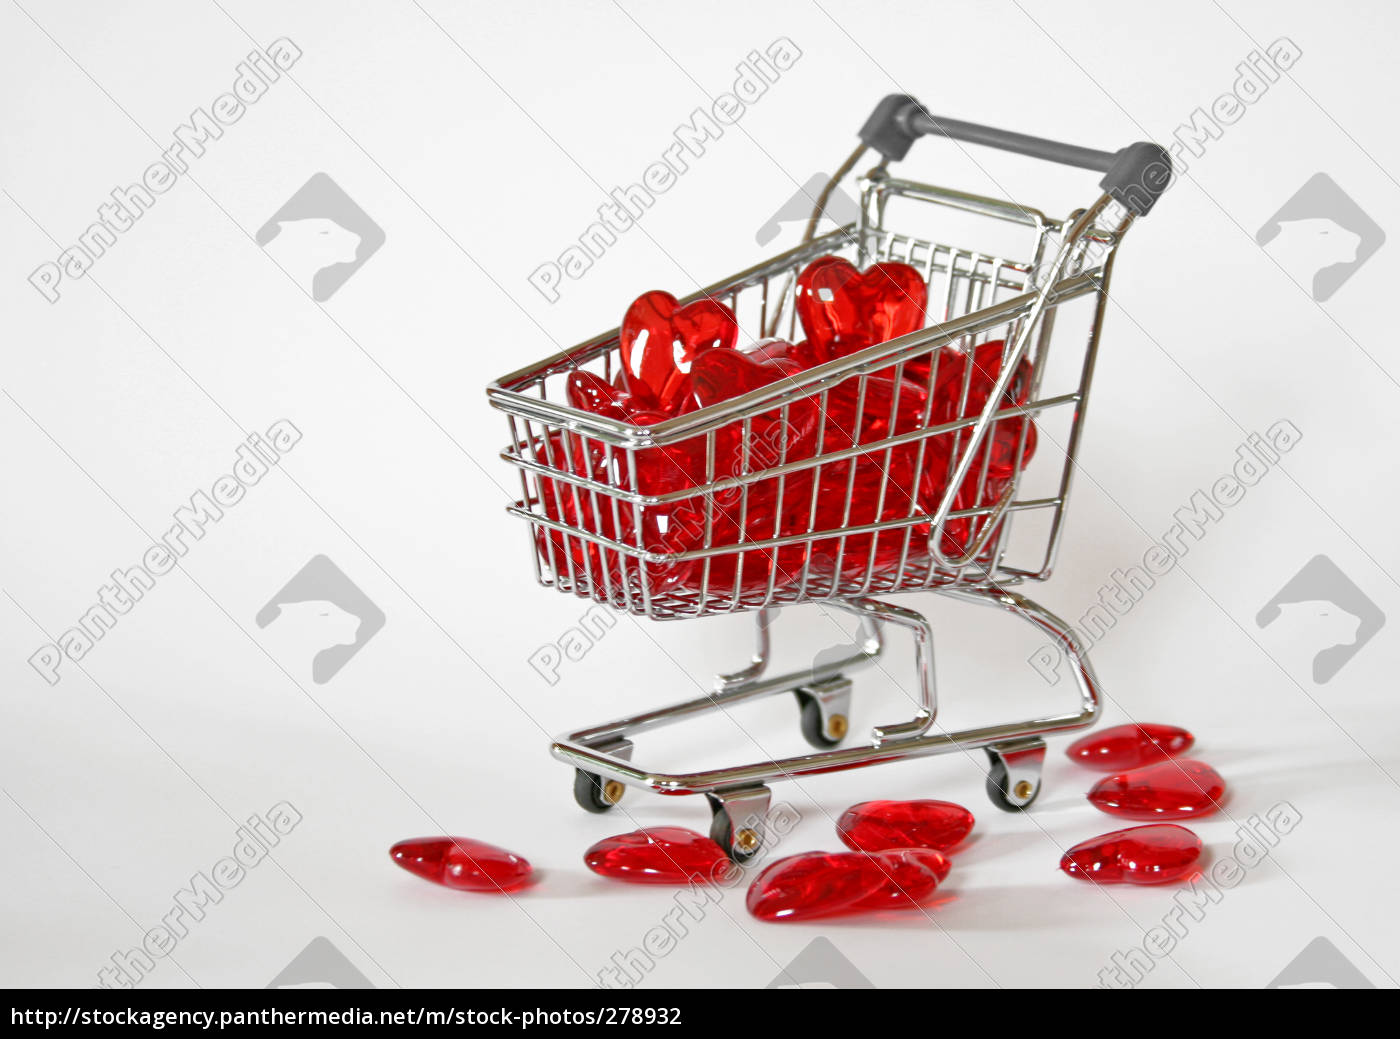 a, basket, full, of, love - 278932